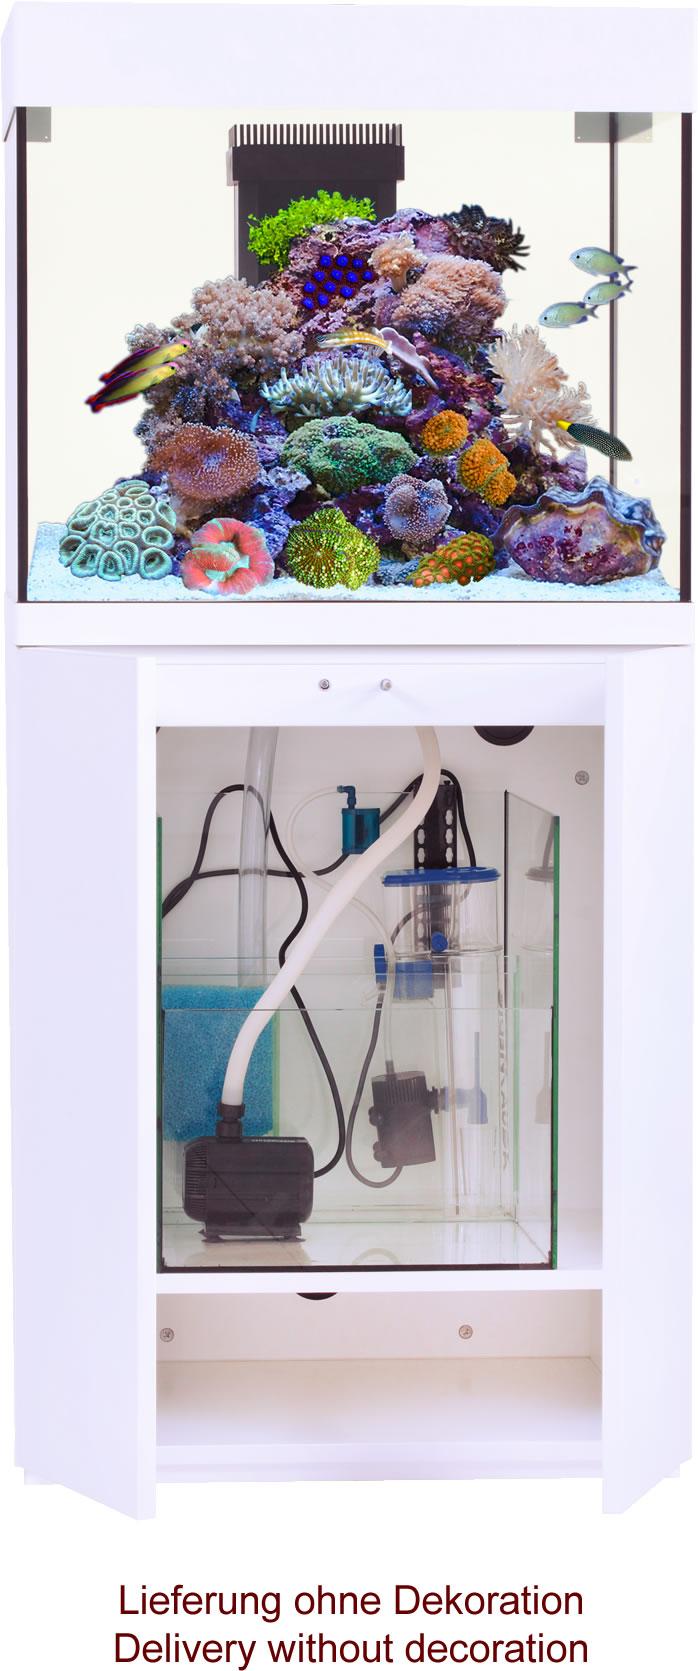 Aqua Medic Kauderni CF Meerwasser-Aquariumkombination wei�